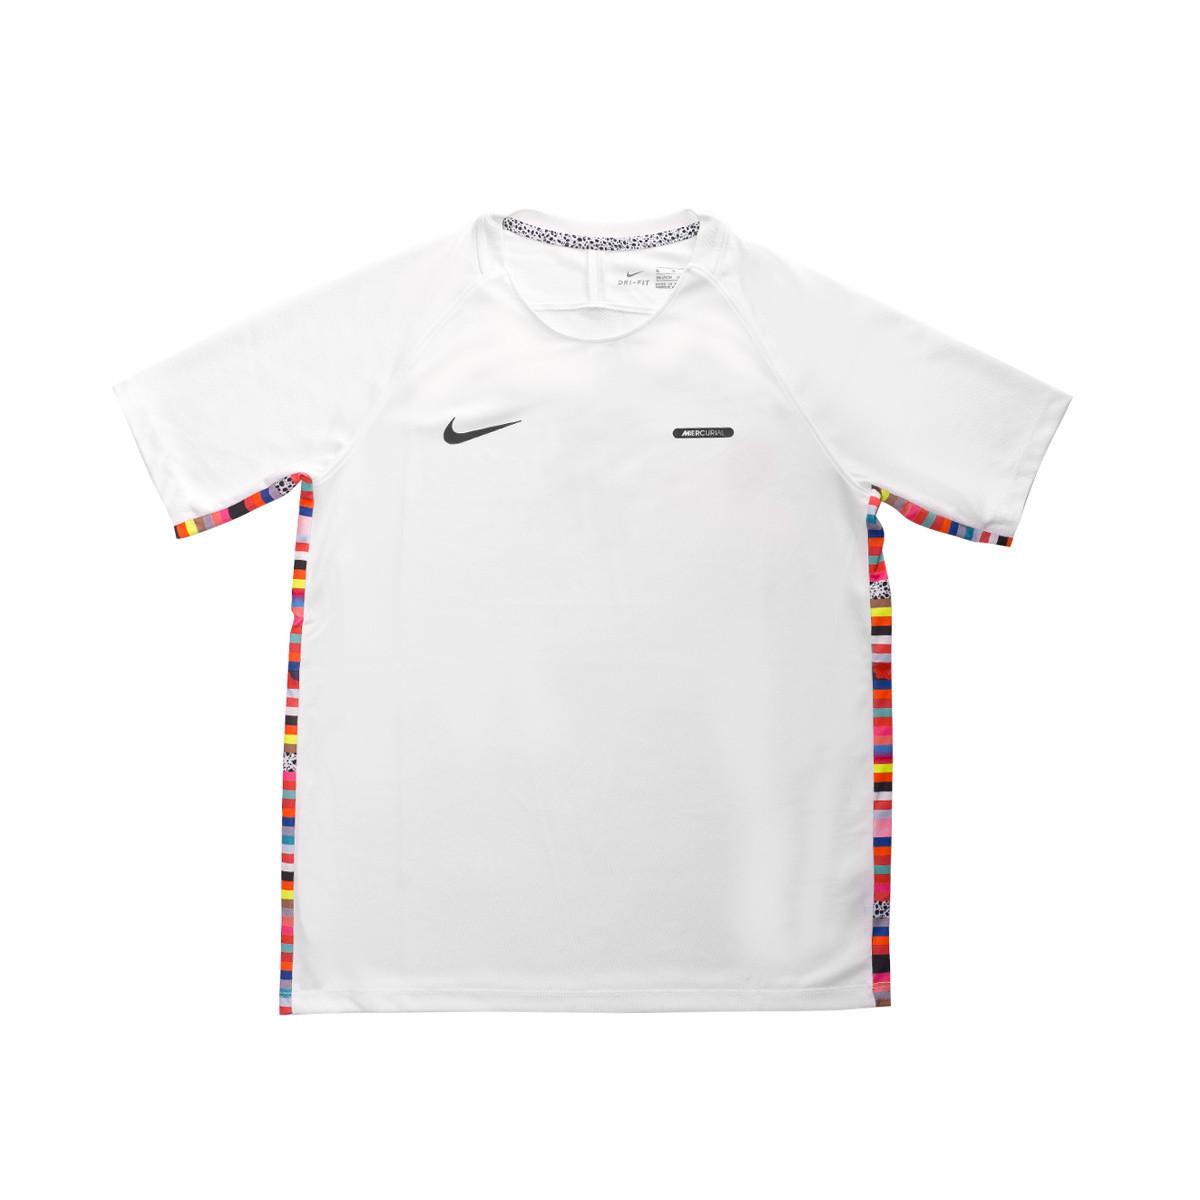 0ebebdae8 Jersey Nike Dry Top LVL UP Niño White-Black - Football store Fútbol ...